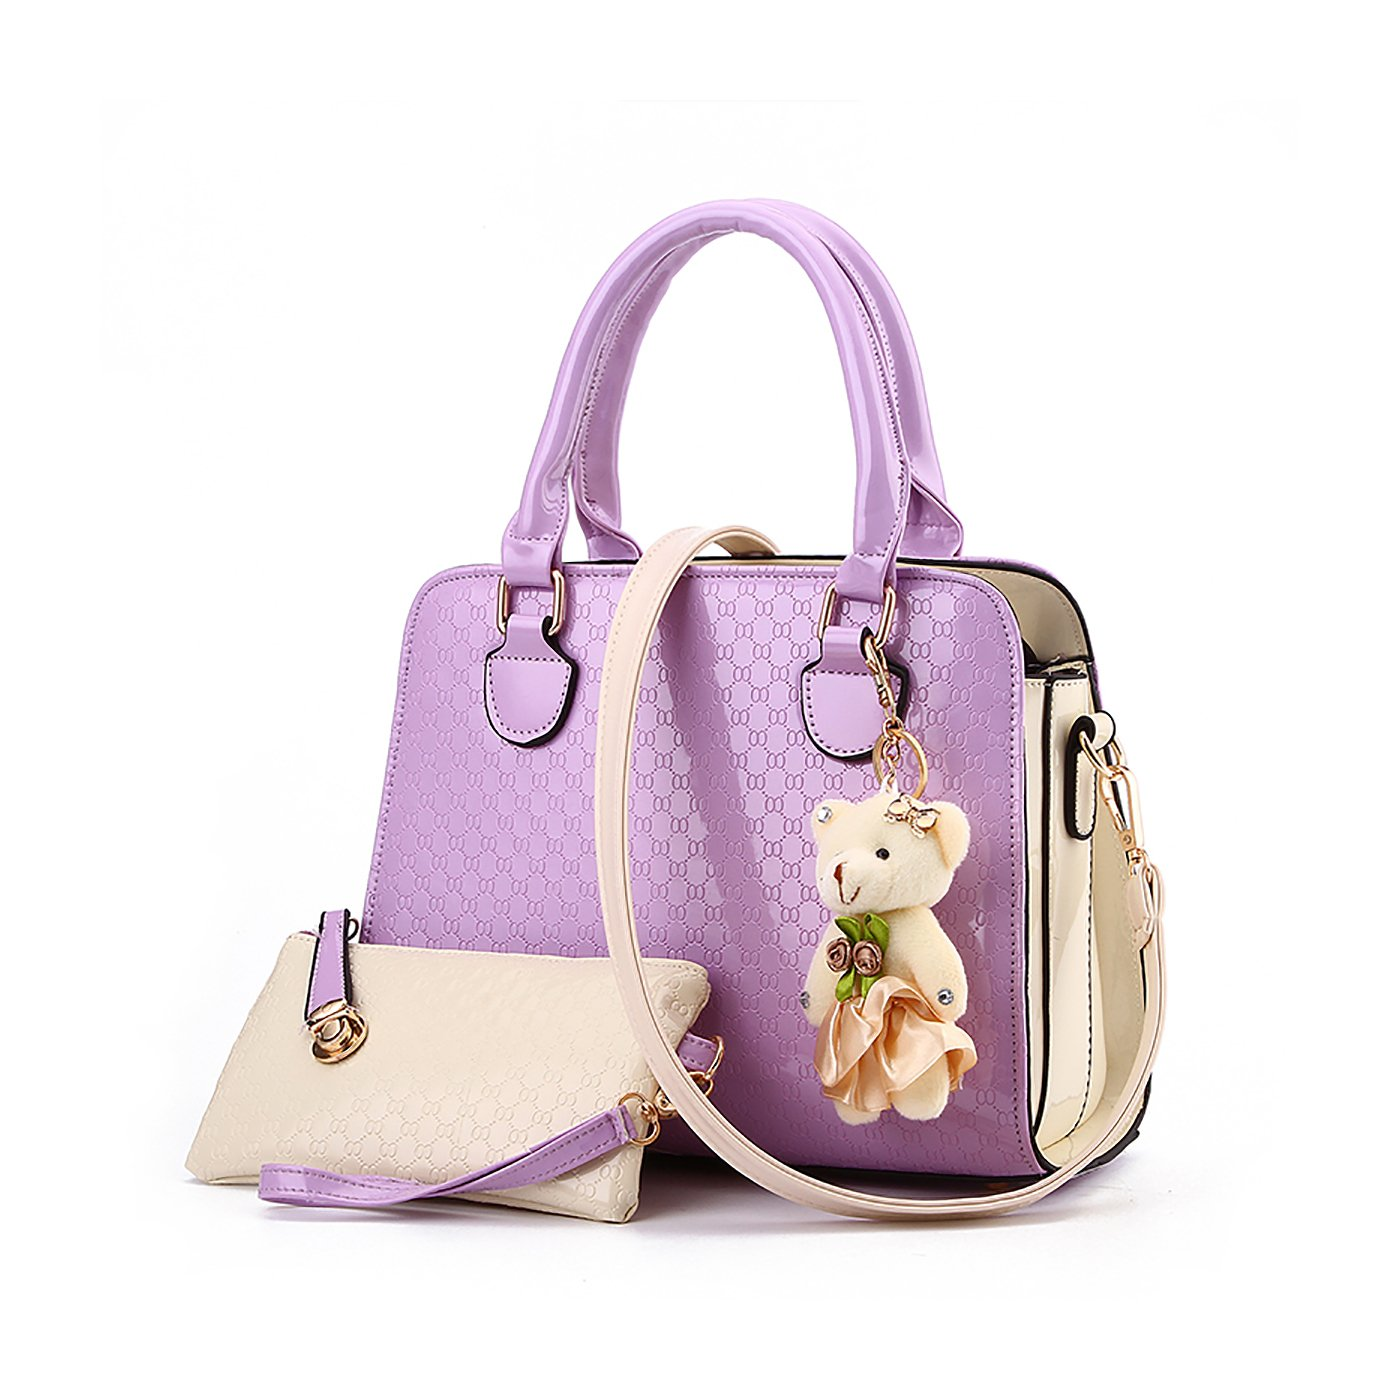 Tisdaini Ladies Sac à Main Sac à Main Sac épaule Messenger Bag Ladies Retro Portefeuille Pendentif Ours KA-KUK6707